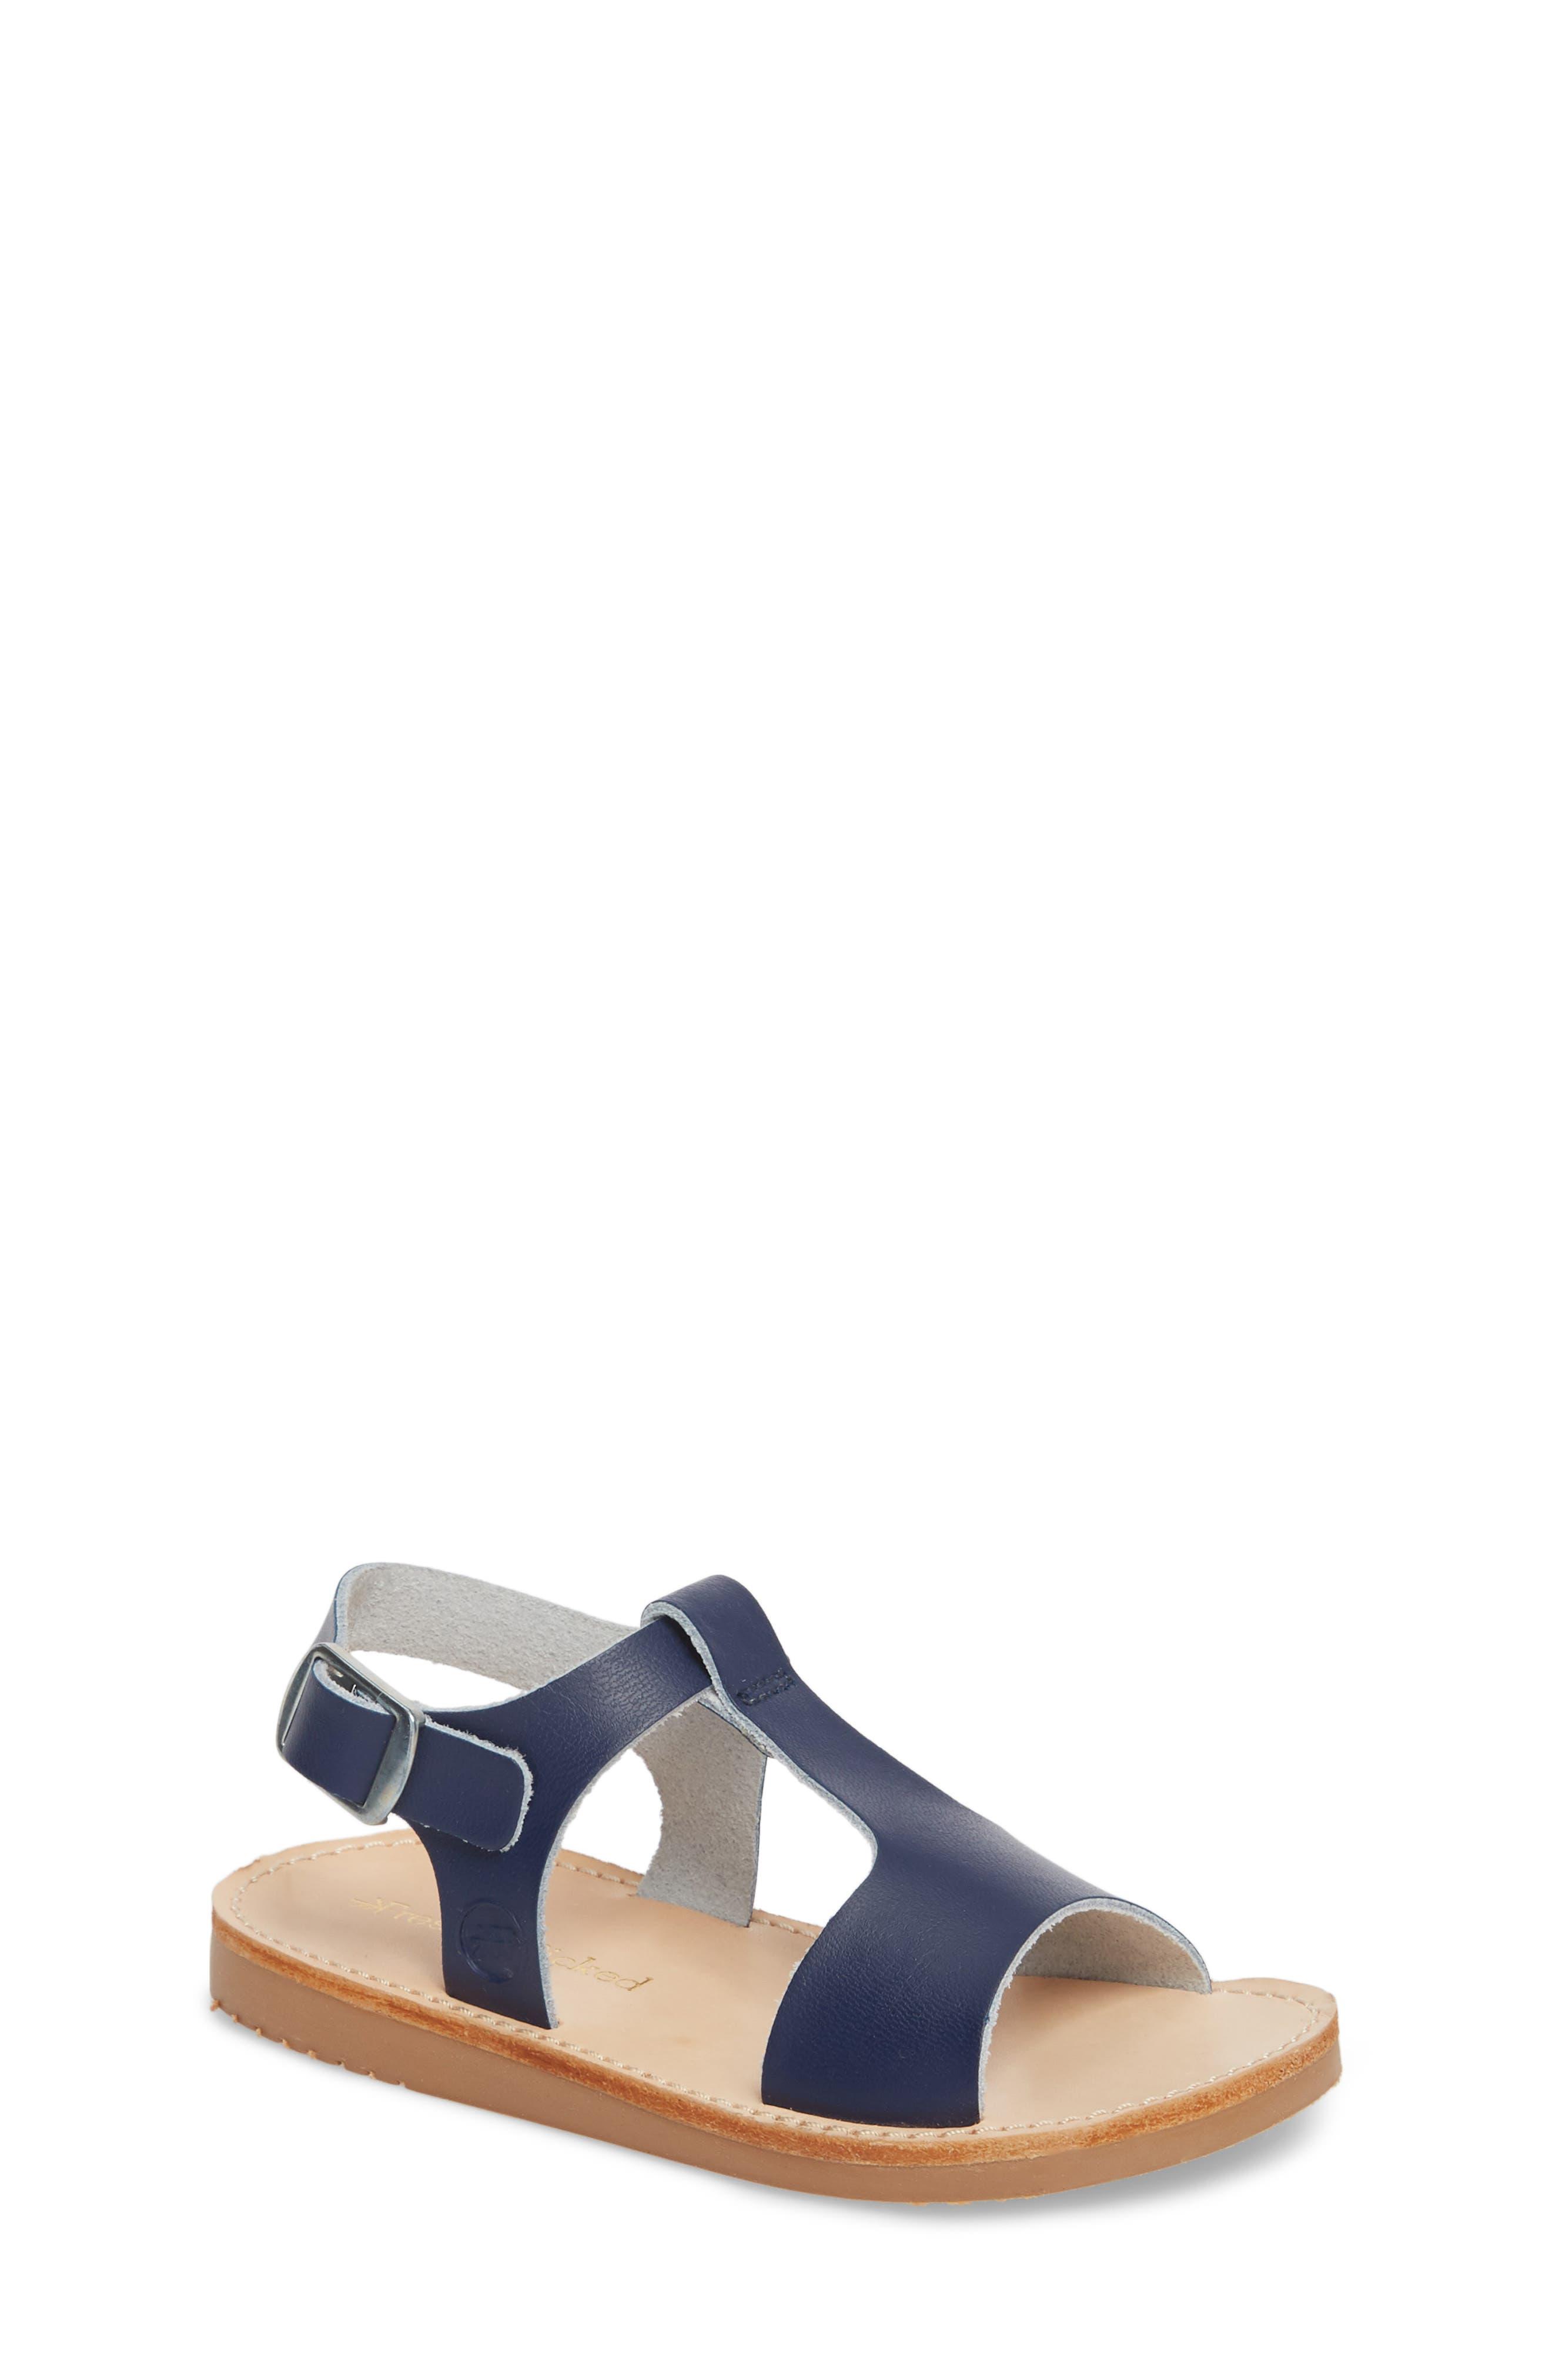 Malibu Water Resistant Sandal,                         Main,                         color, Navy